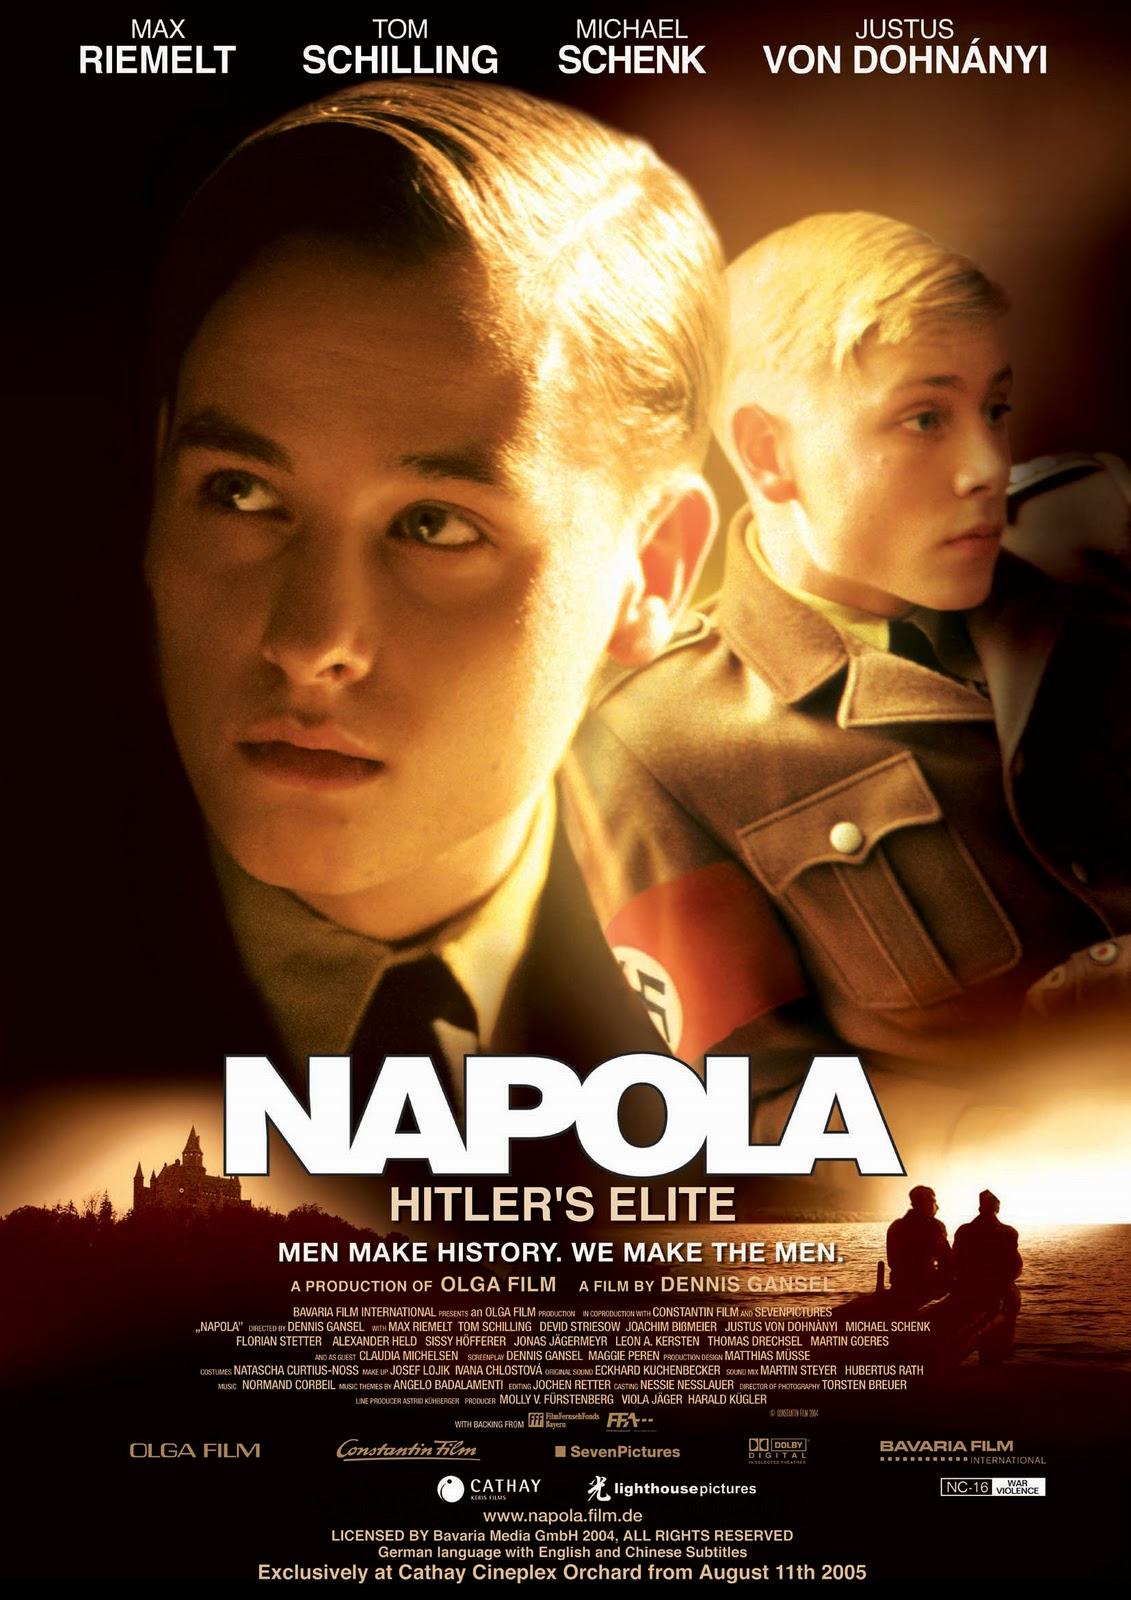 Napola: Doctrina Nazi